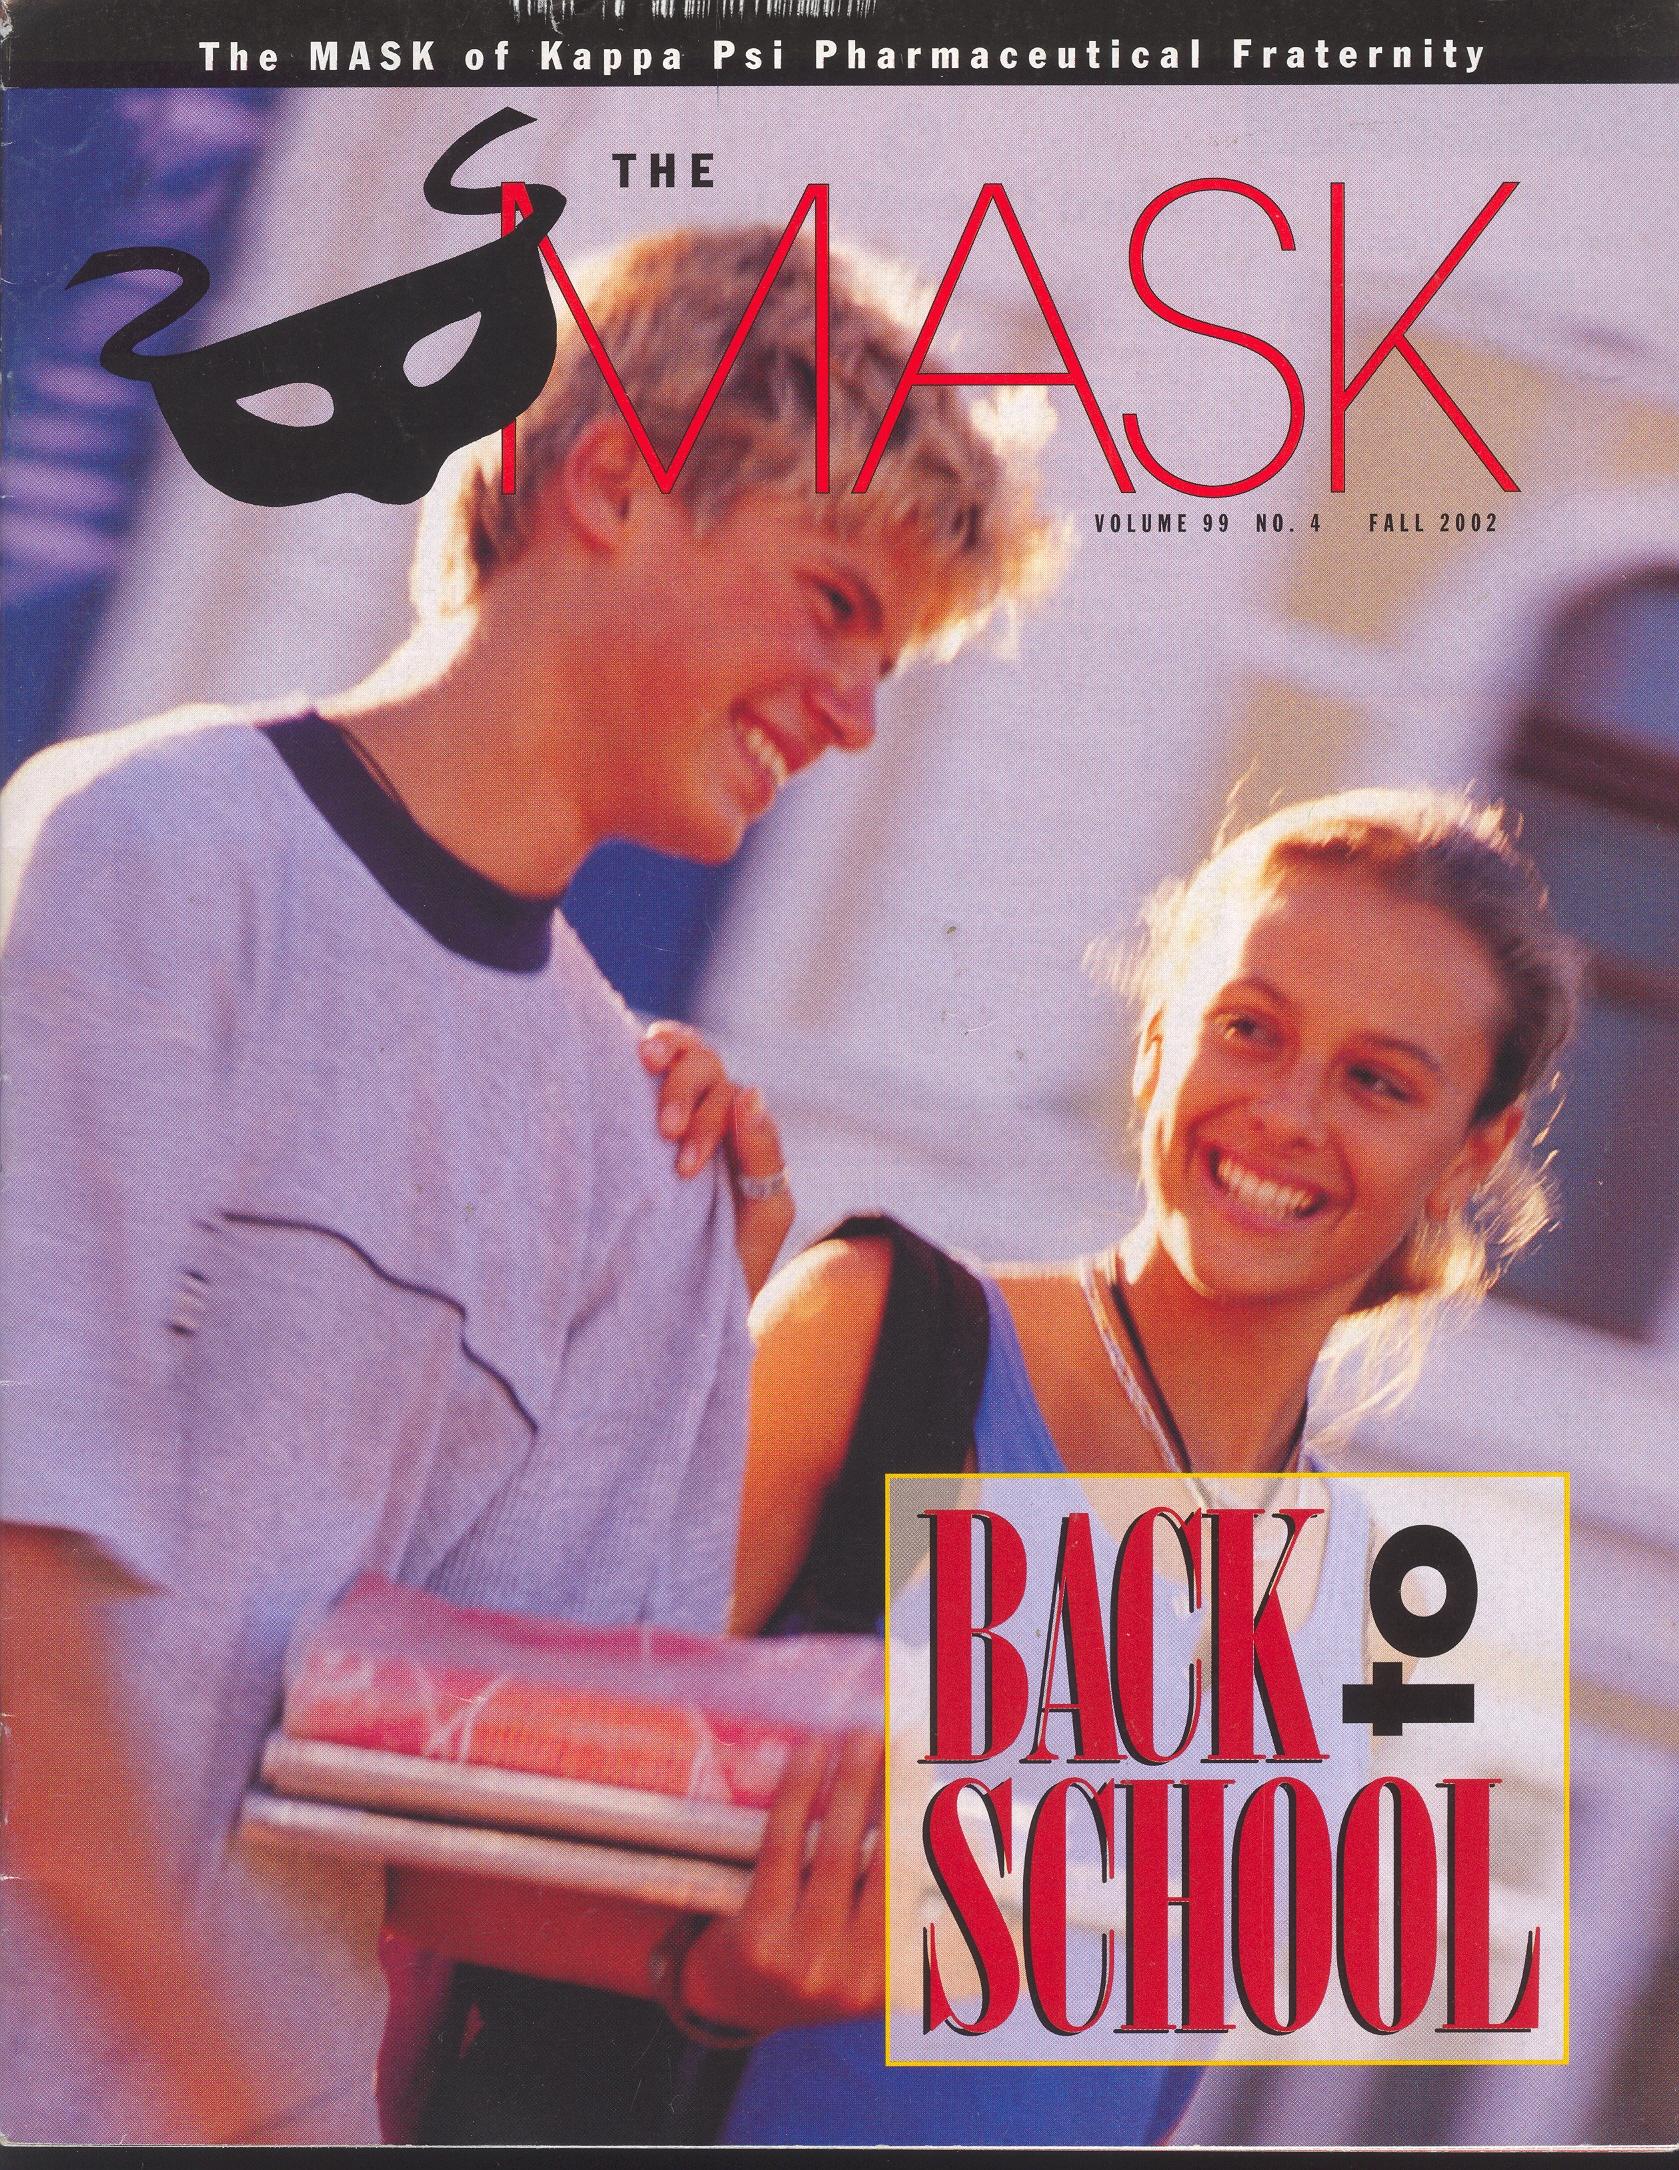 mask_cover_99-4_2002_fall.jpg